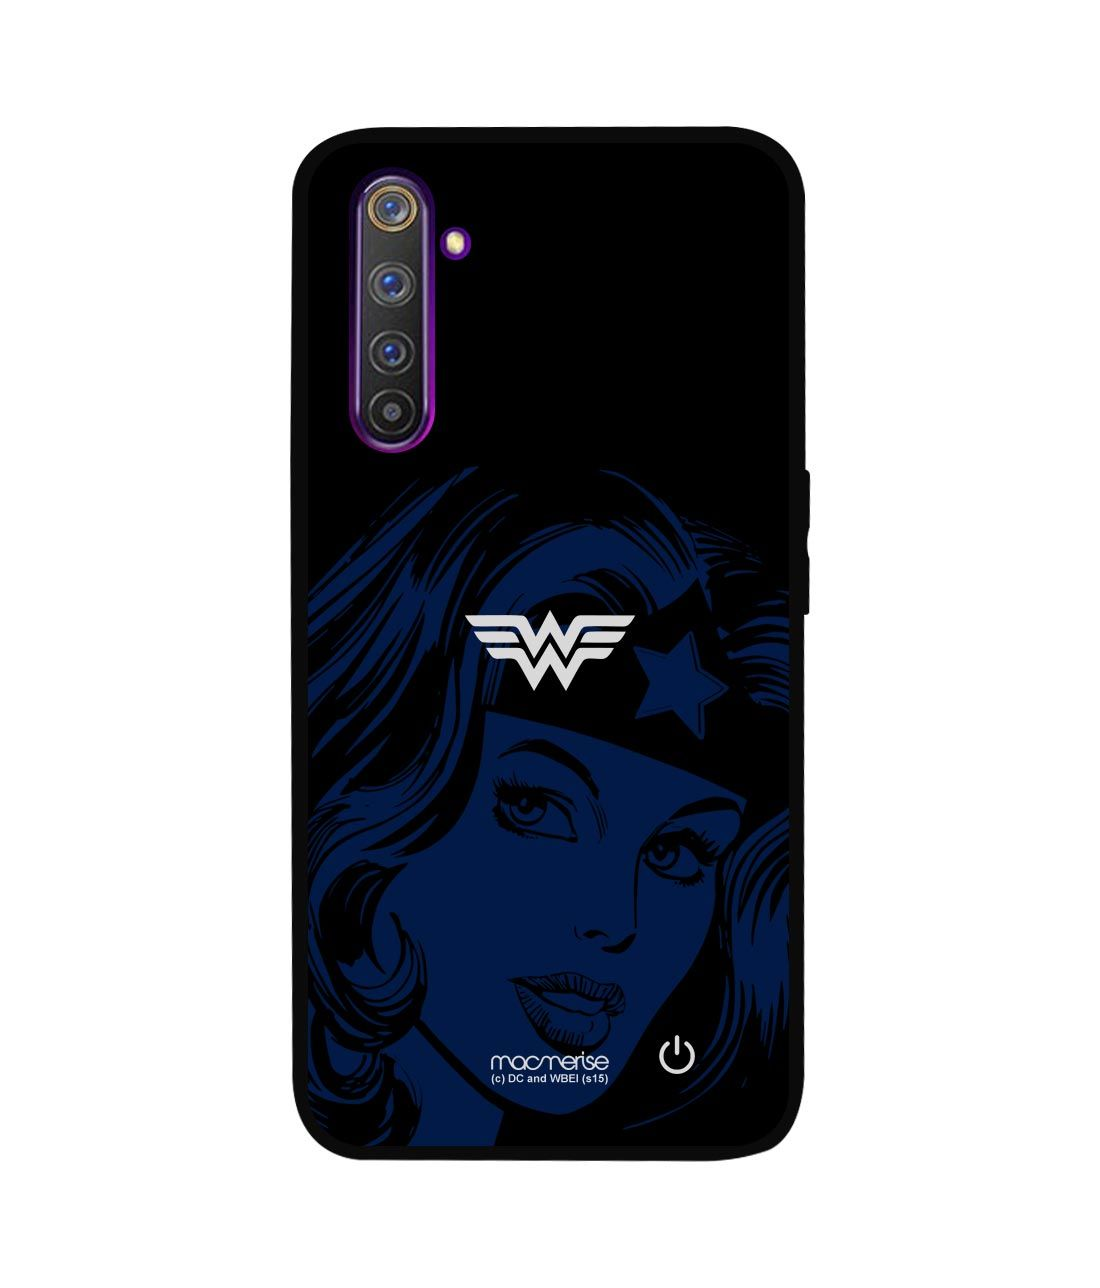 Silhouette Wonder Woman - Lumous LED Phone Case for Realme 6 Pro